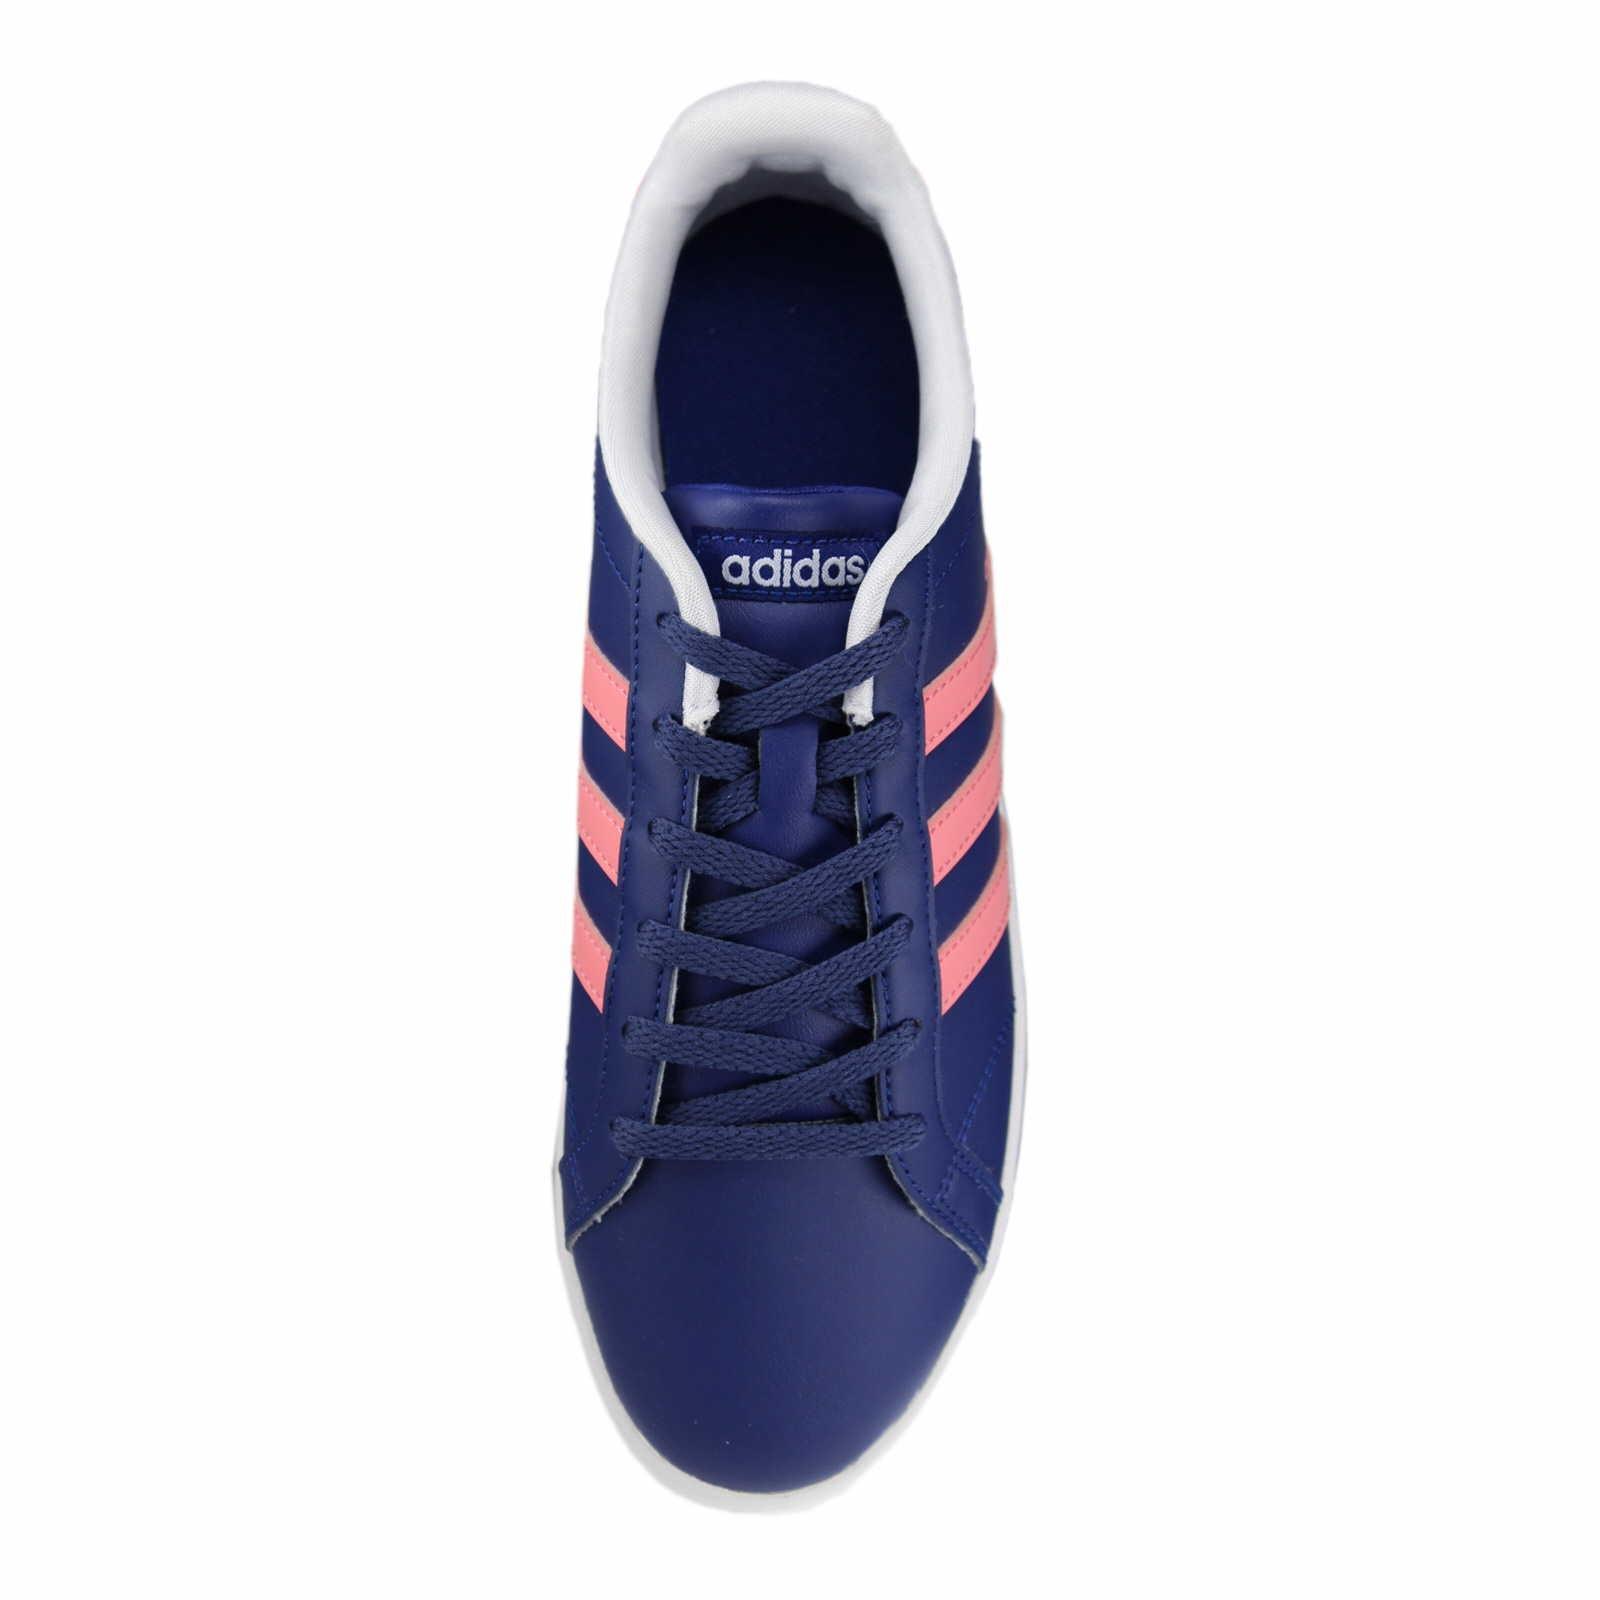 top quality adidas neo canvas blau grün 60100 ad6fd